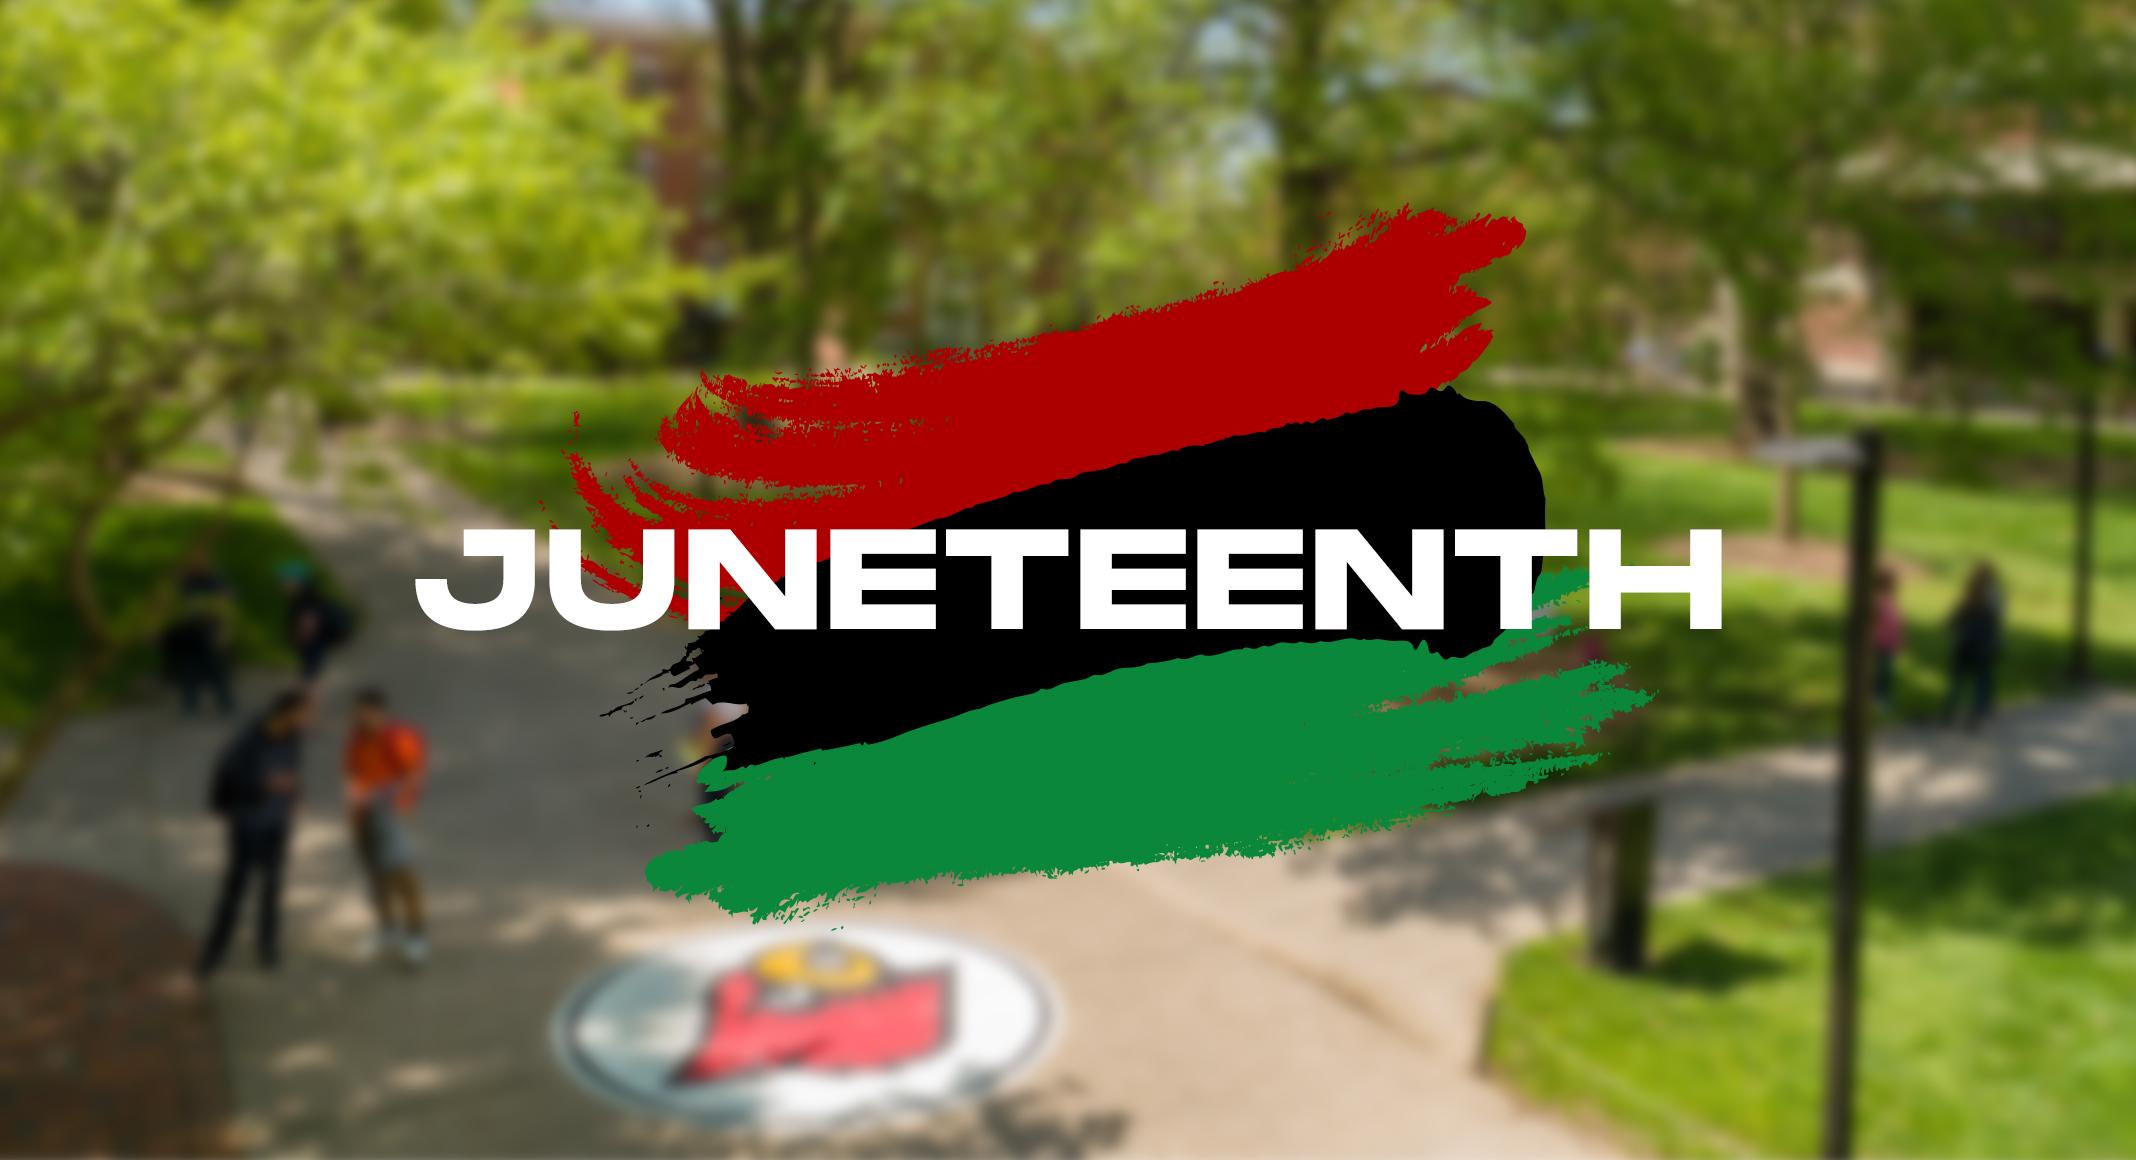 Juneteenth at UofL